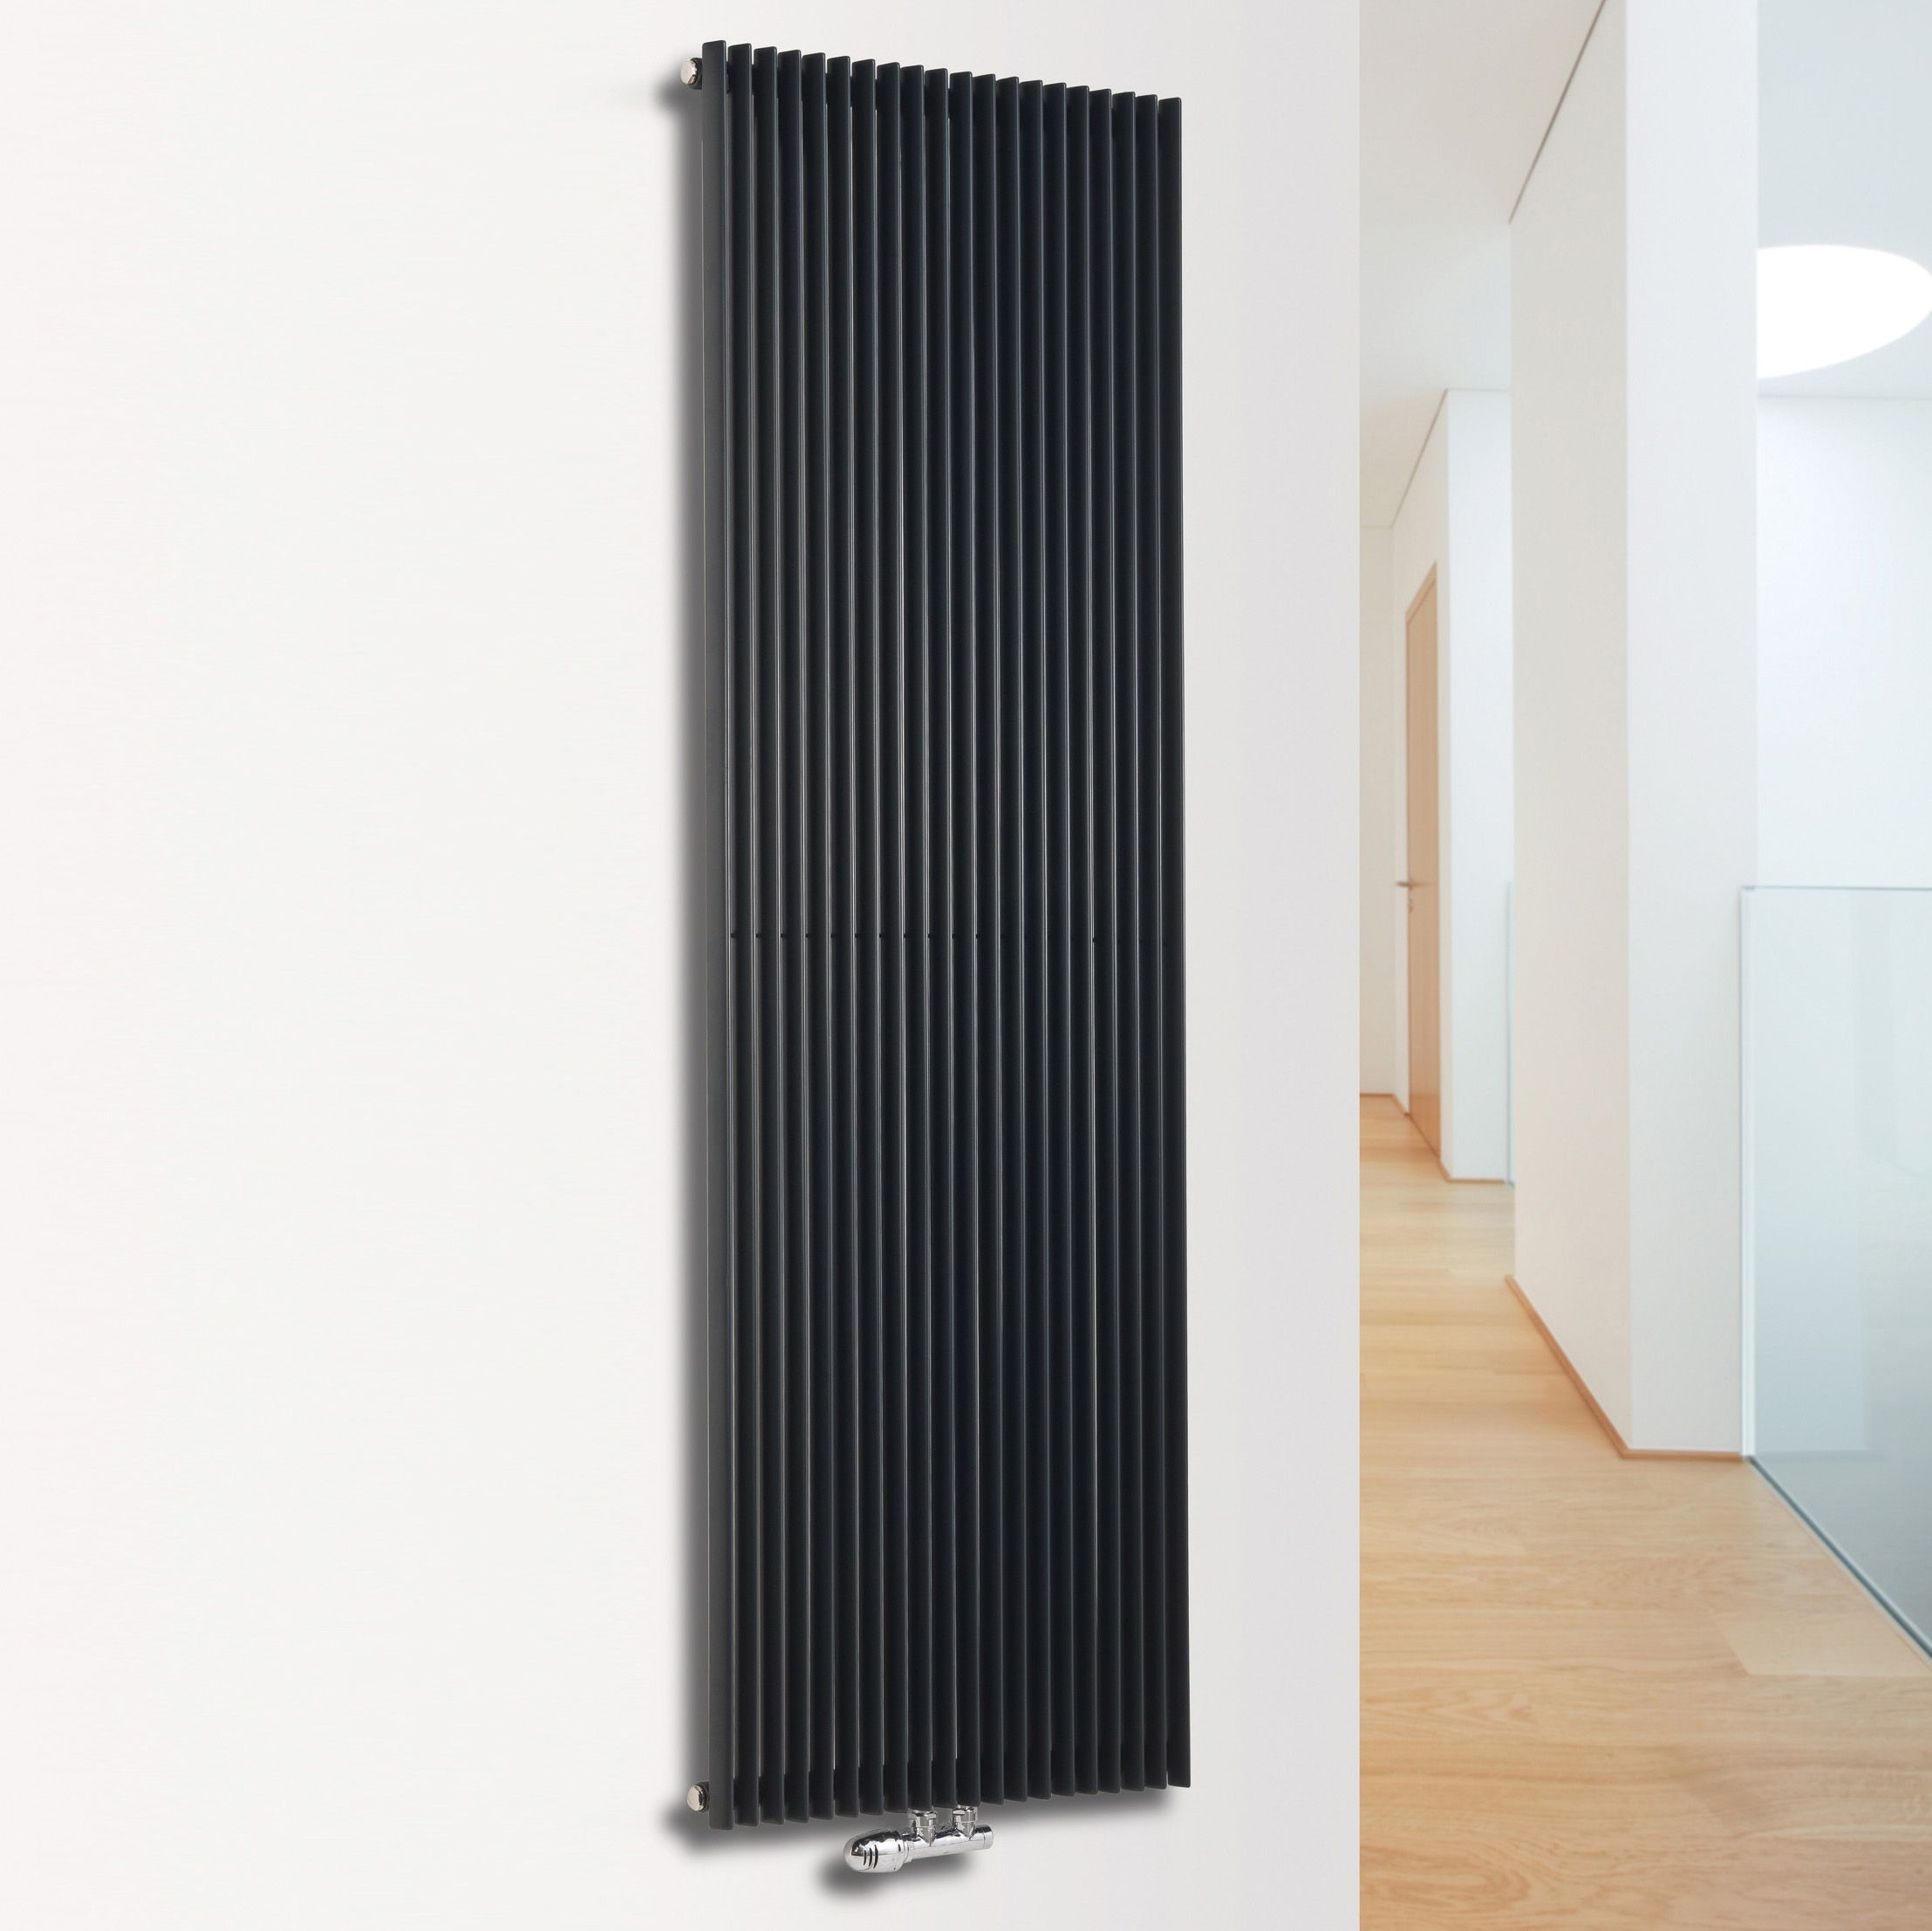 jaga iguana aplano vertical radiator white h 1800 mm w. Black Bedroom Furniture Sets. Home Design Ideas